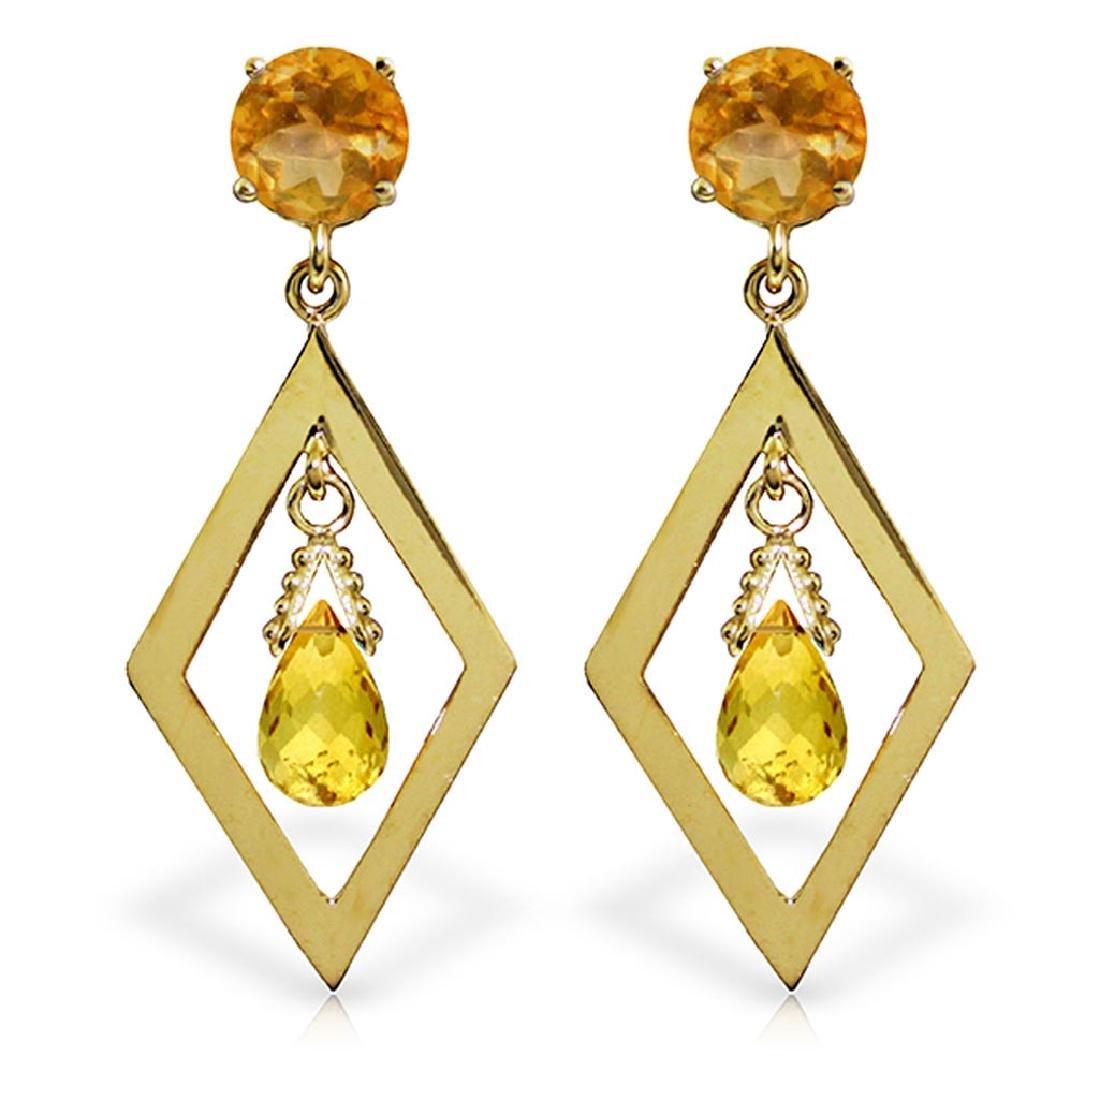 2.4 Carat 14K Solid Gold Euphoria Citrine Earrings